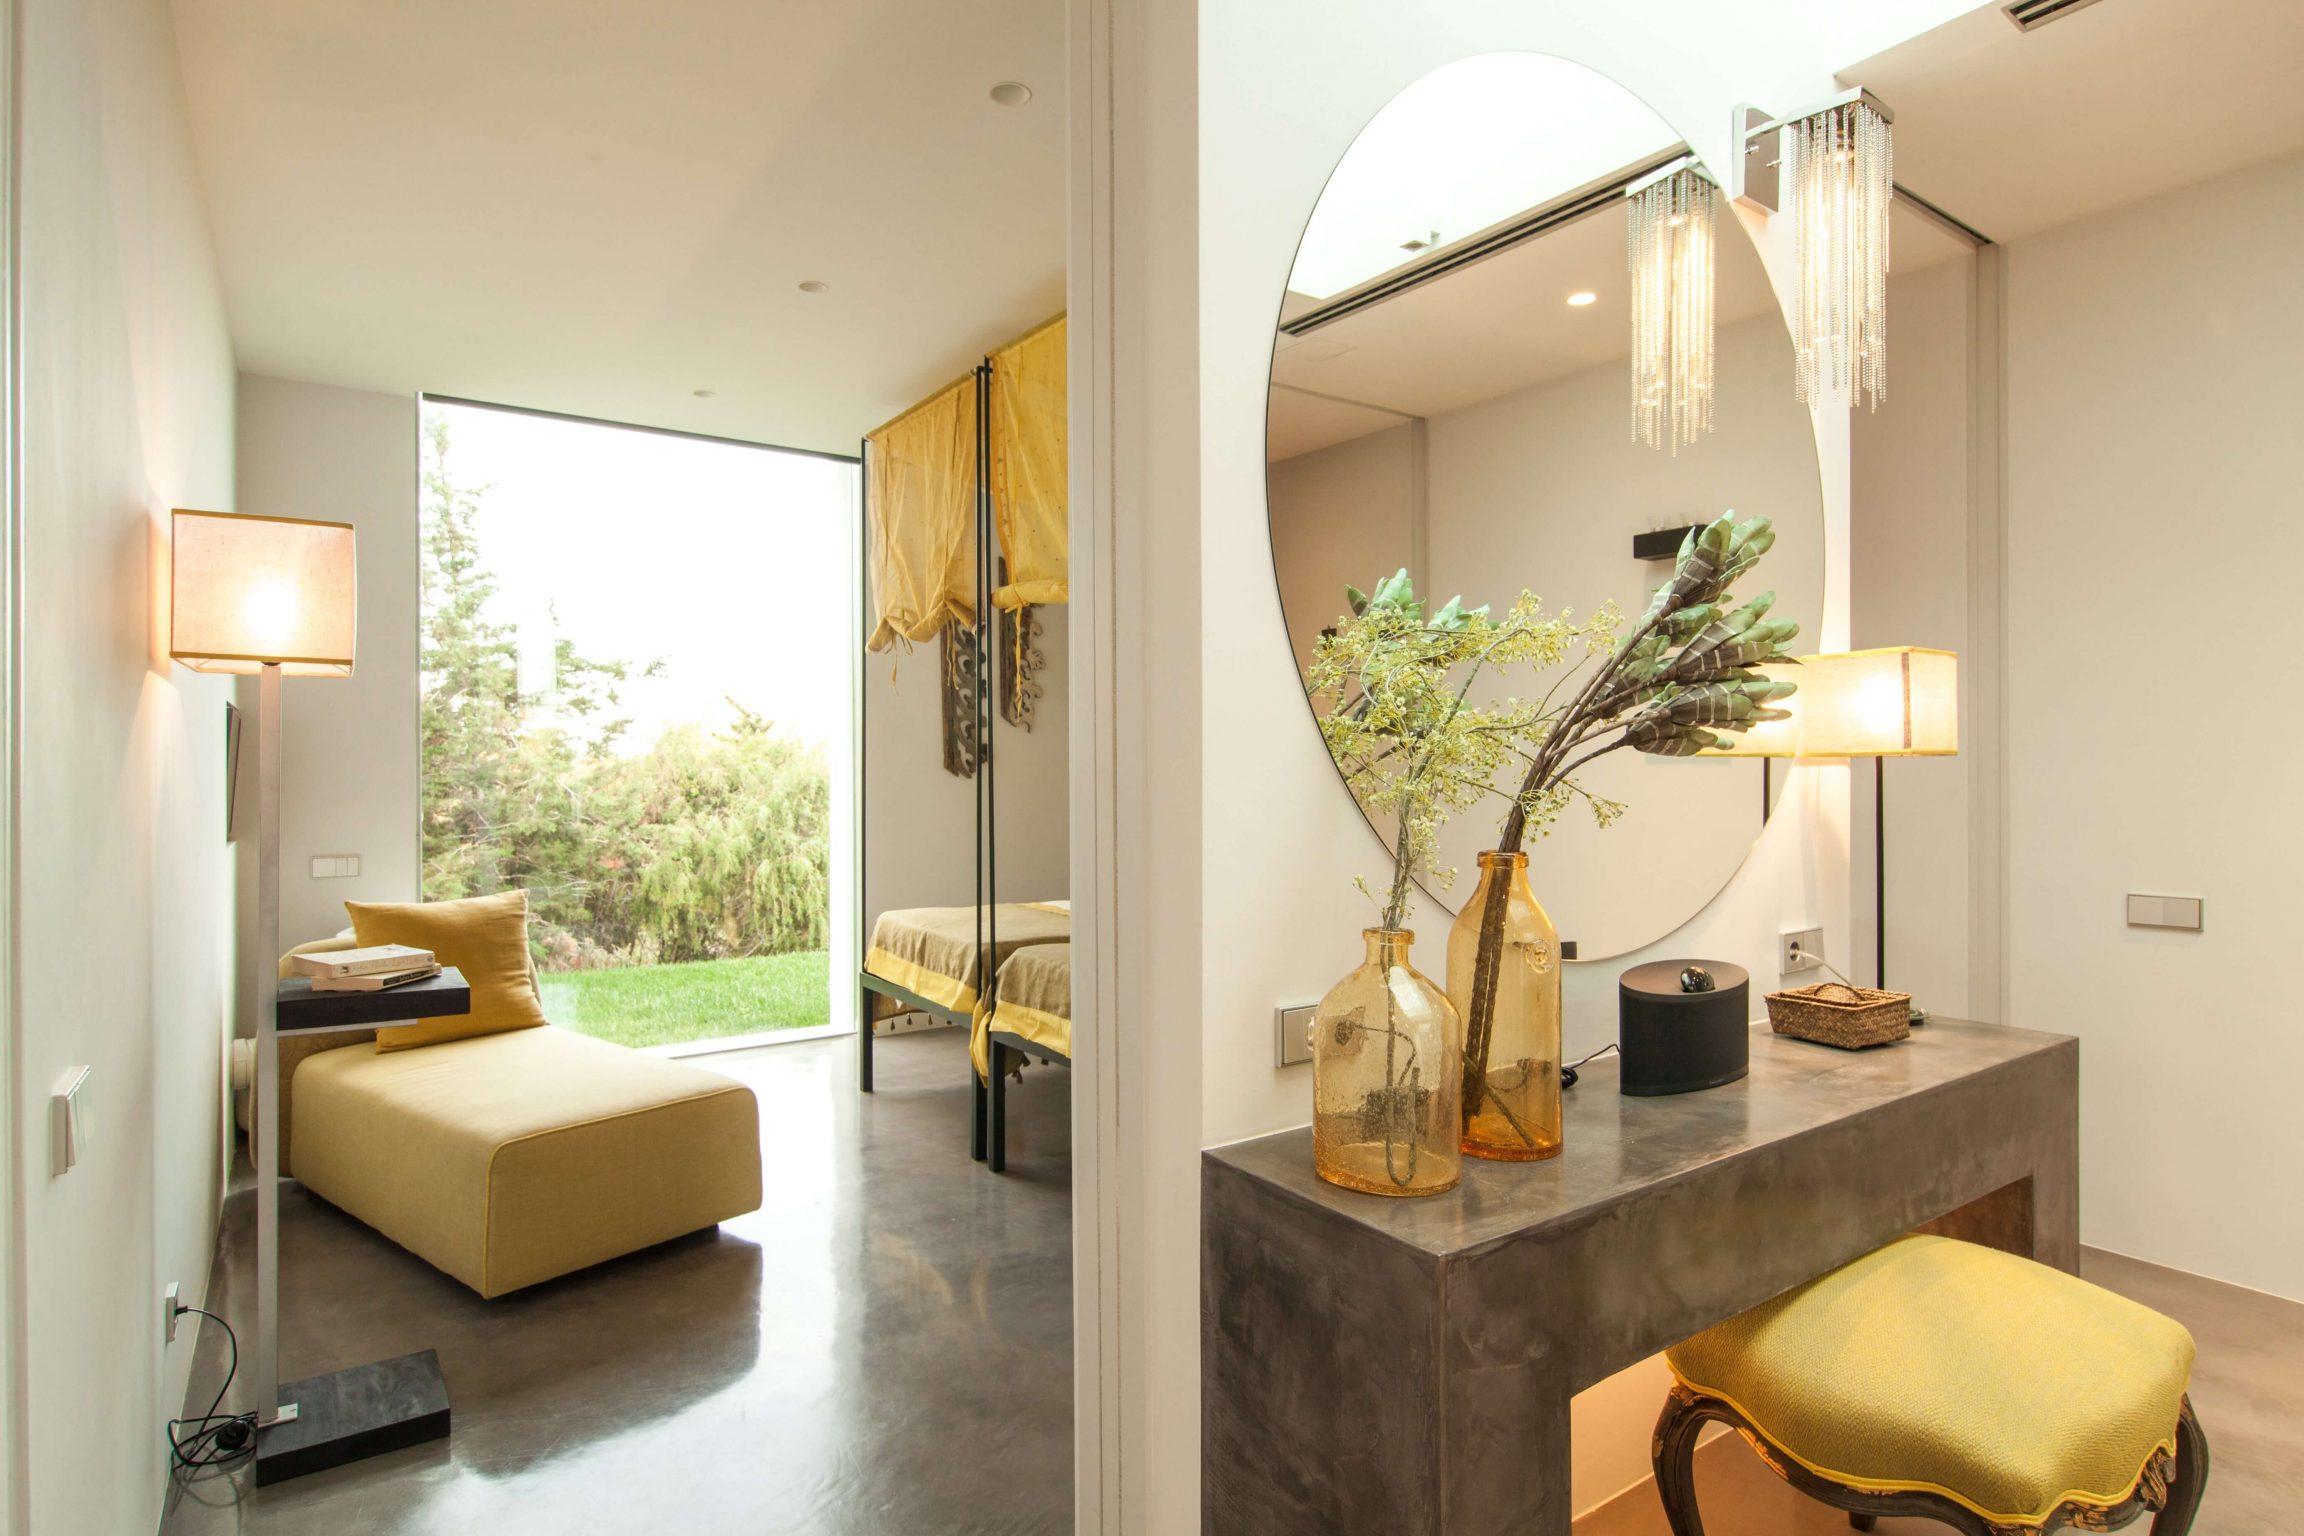 https://www.white-ibiza.com/wp-content/uploads/2020/05/white-ibiza-villas-can-zama-bedroom-two-dressing-room-2304x1536.jpg